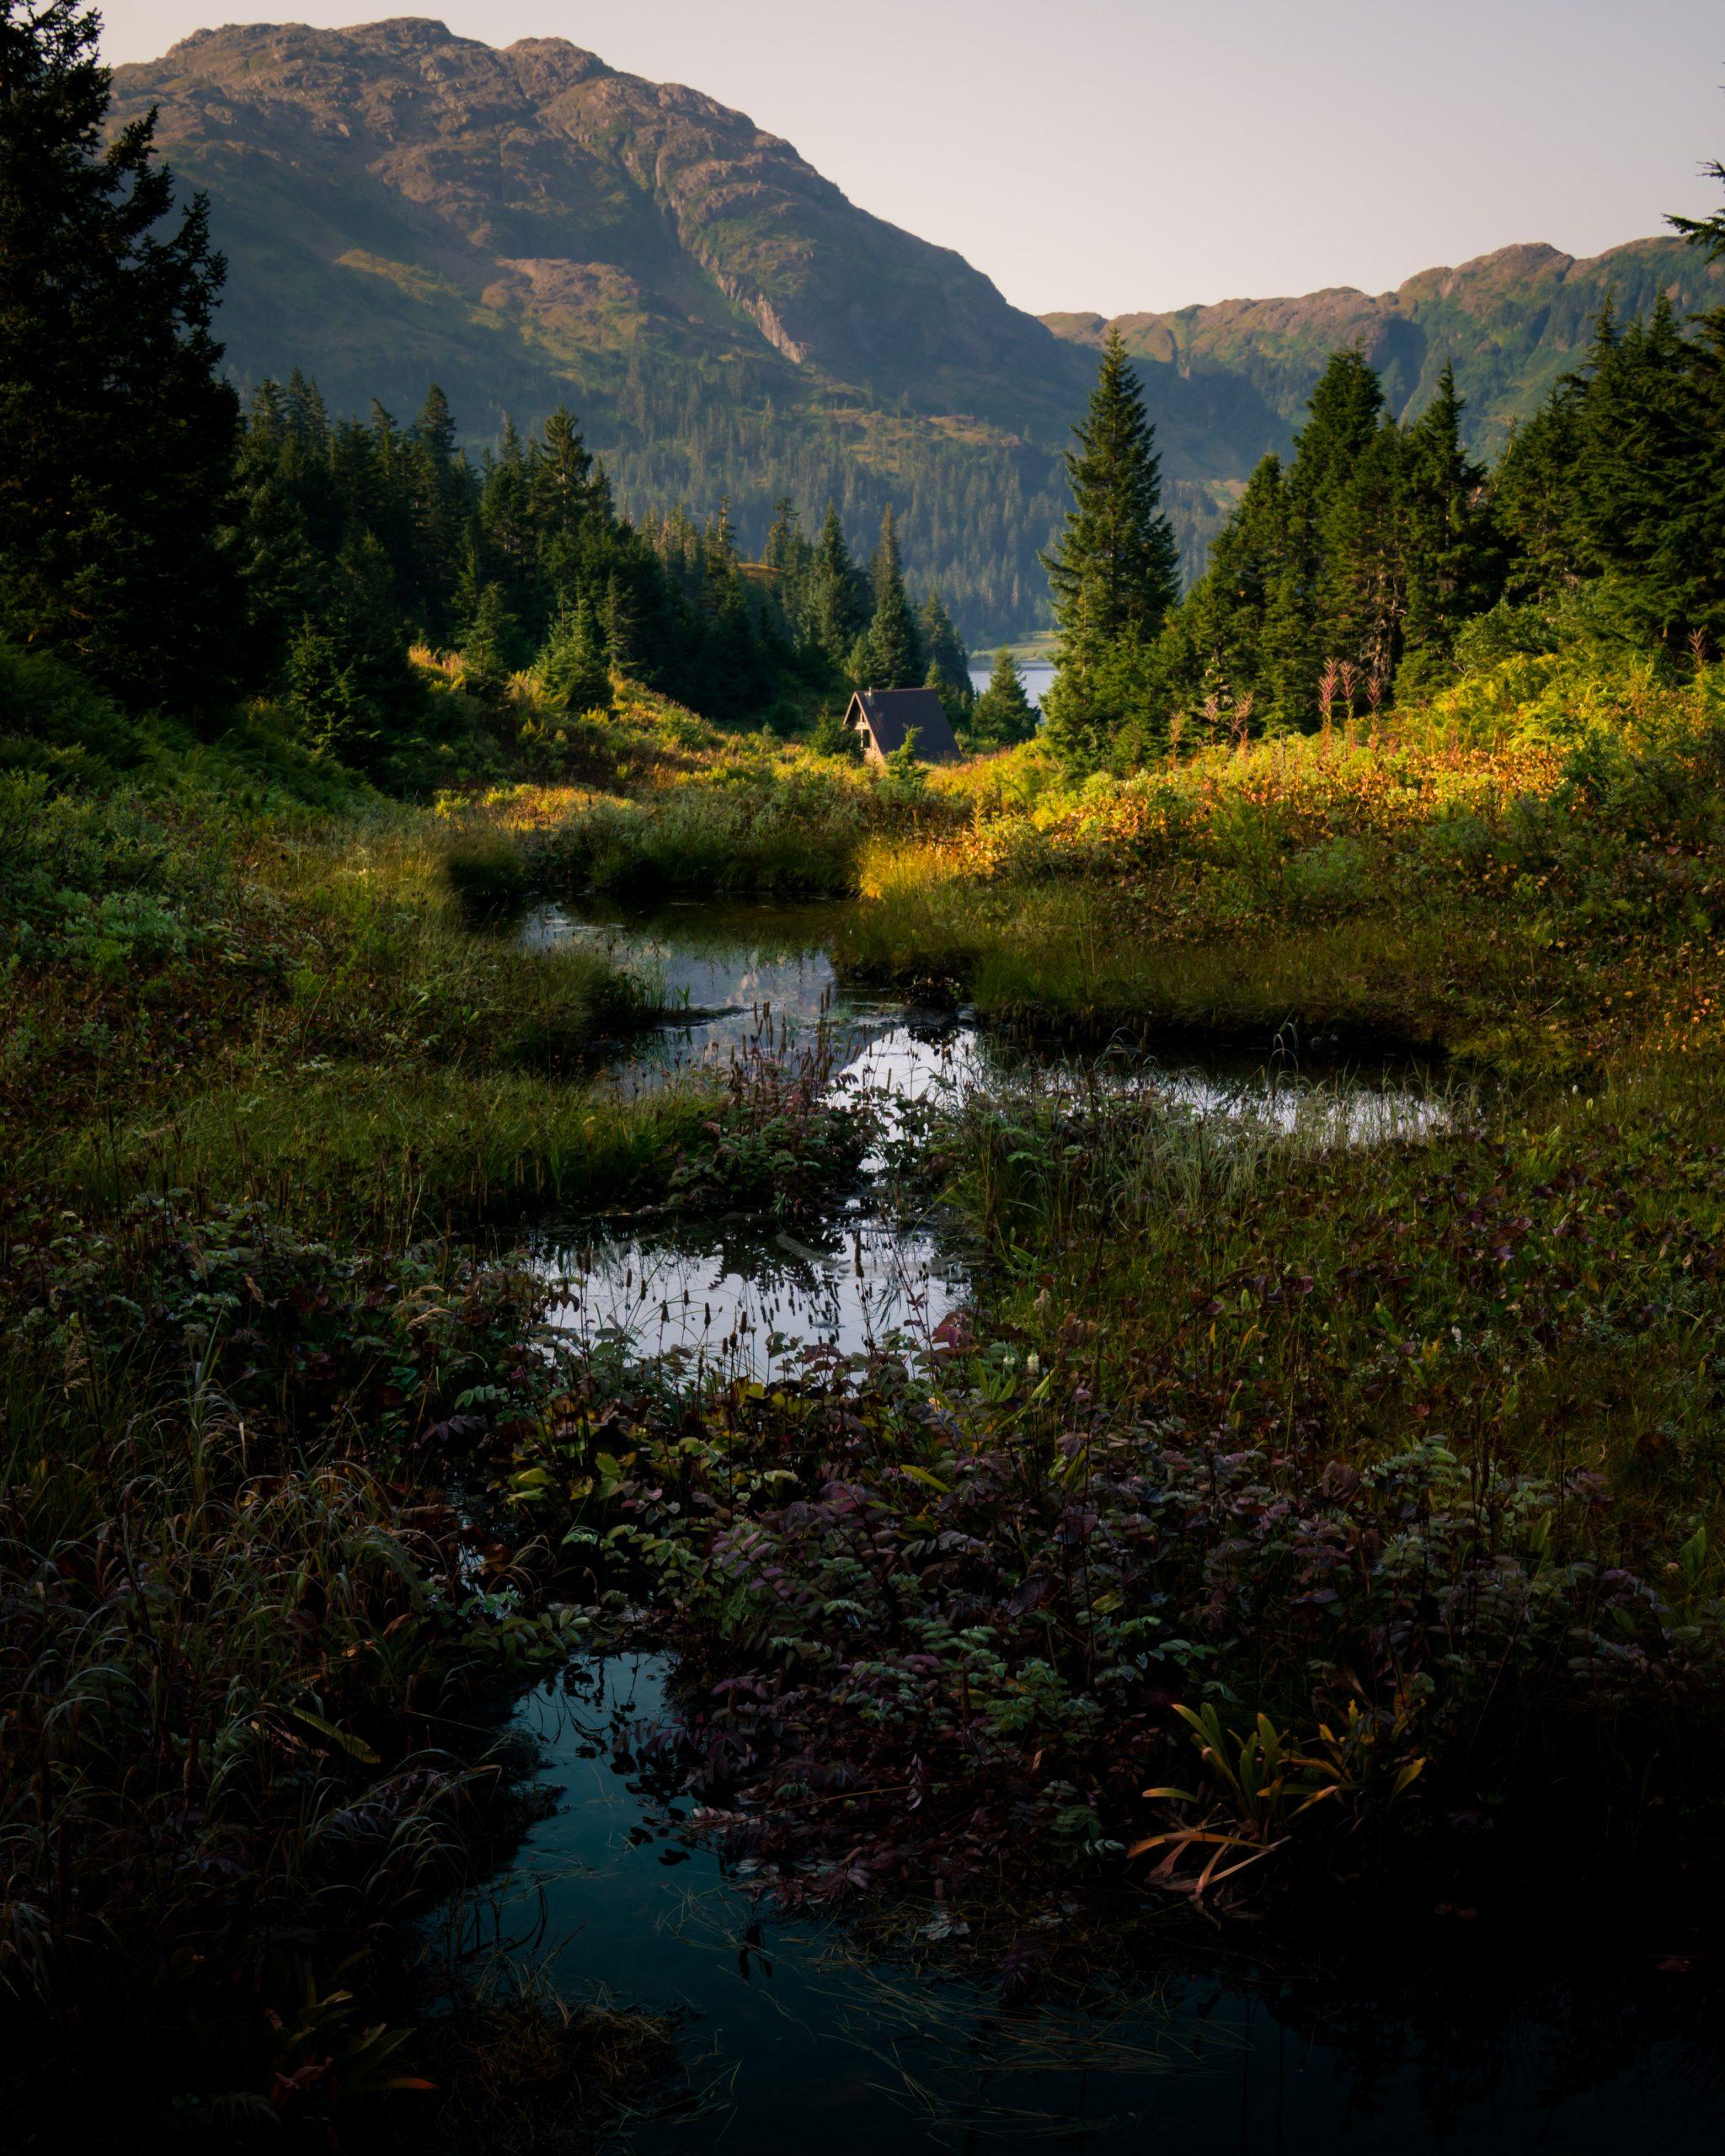 color landscape photograph of Prince William Sound island, Alaska